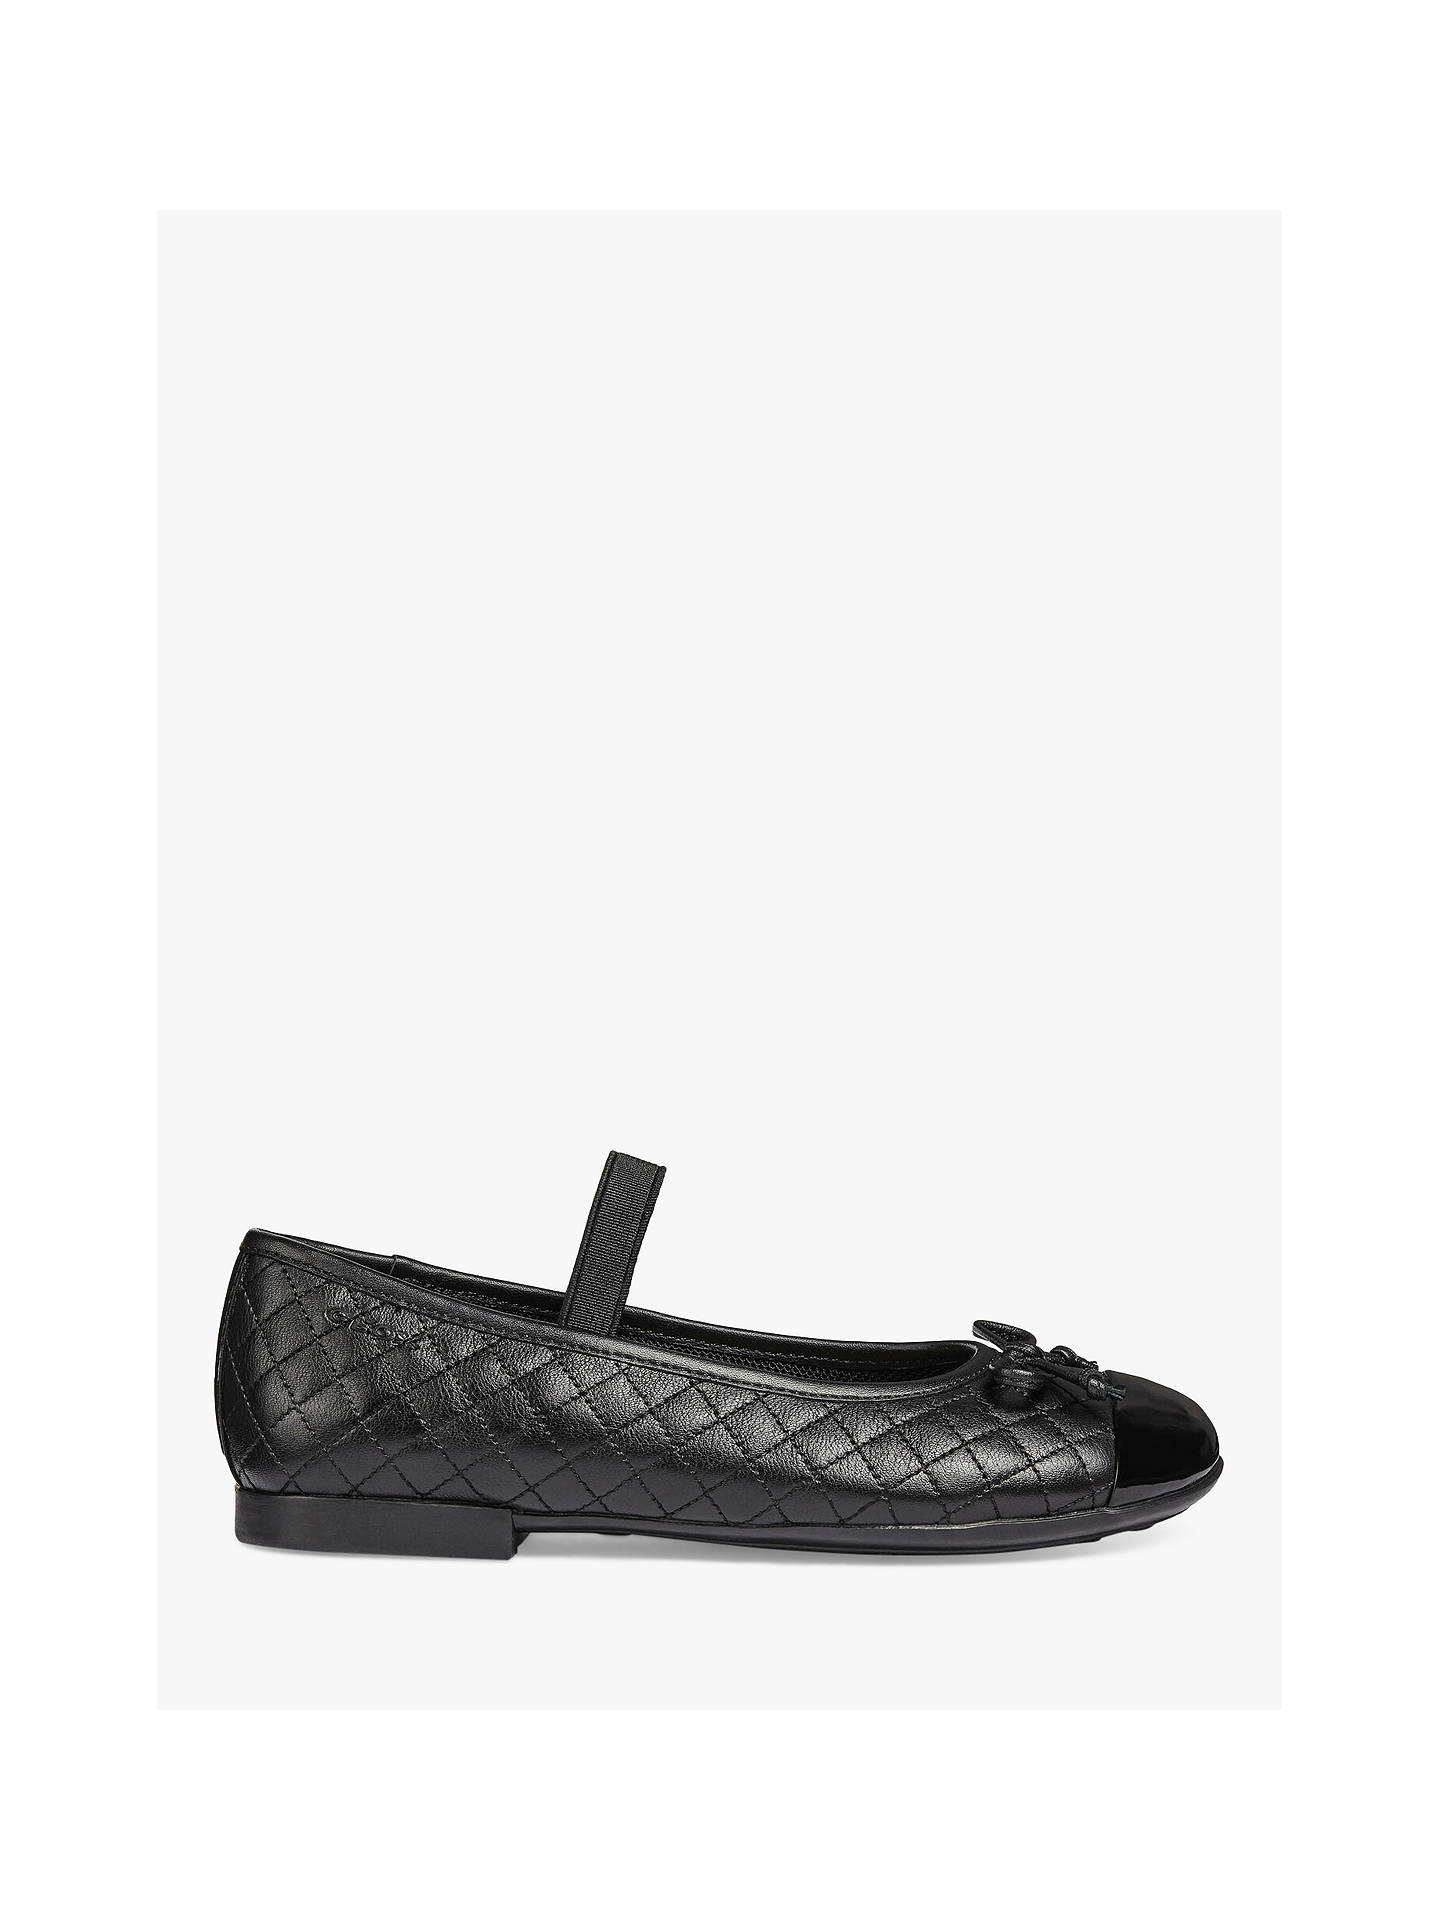 Geox Children's J Plie Ballet School Shoes, Black